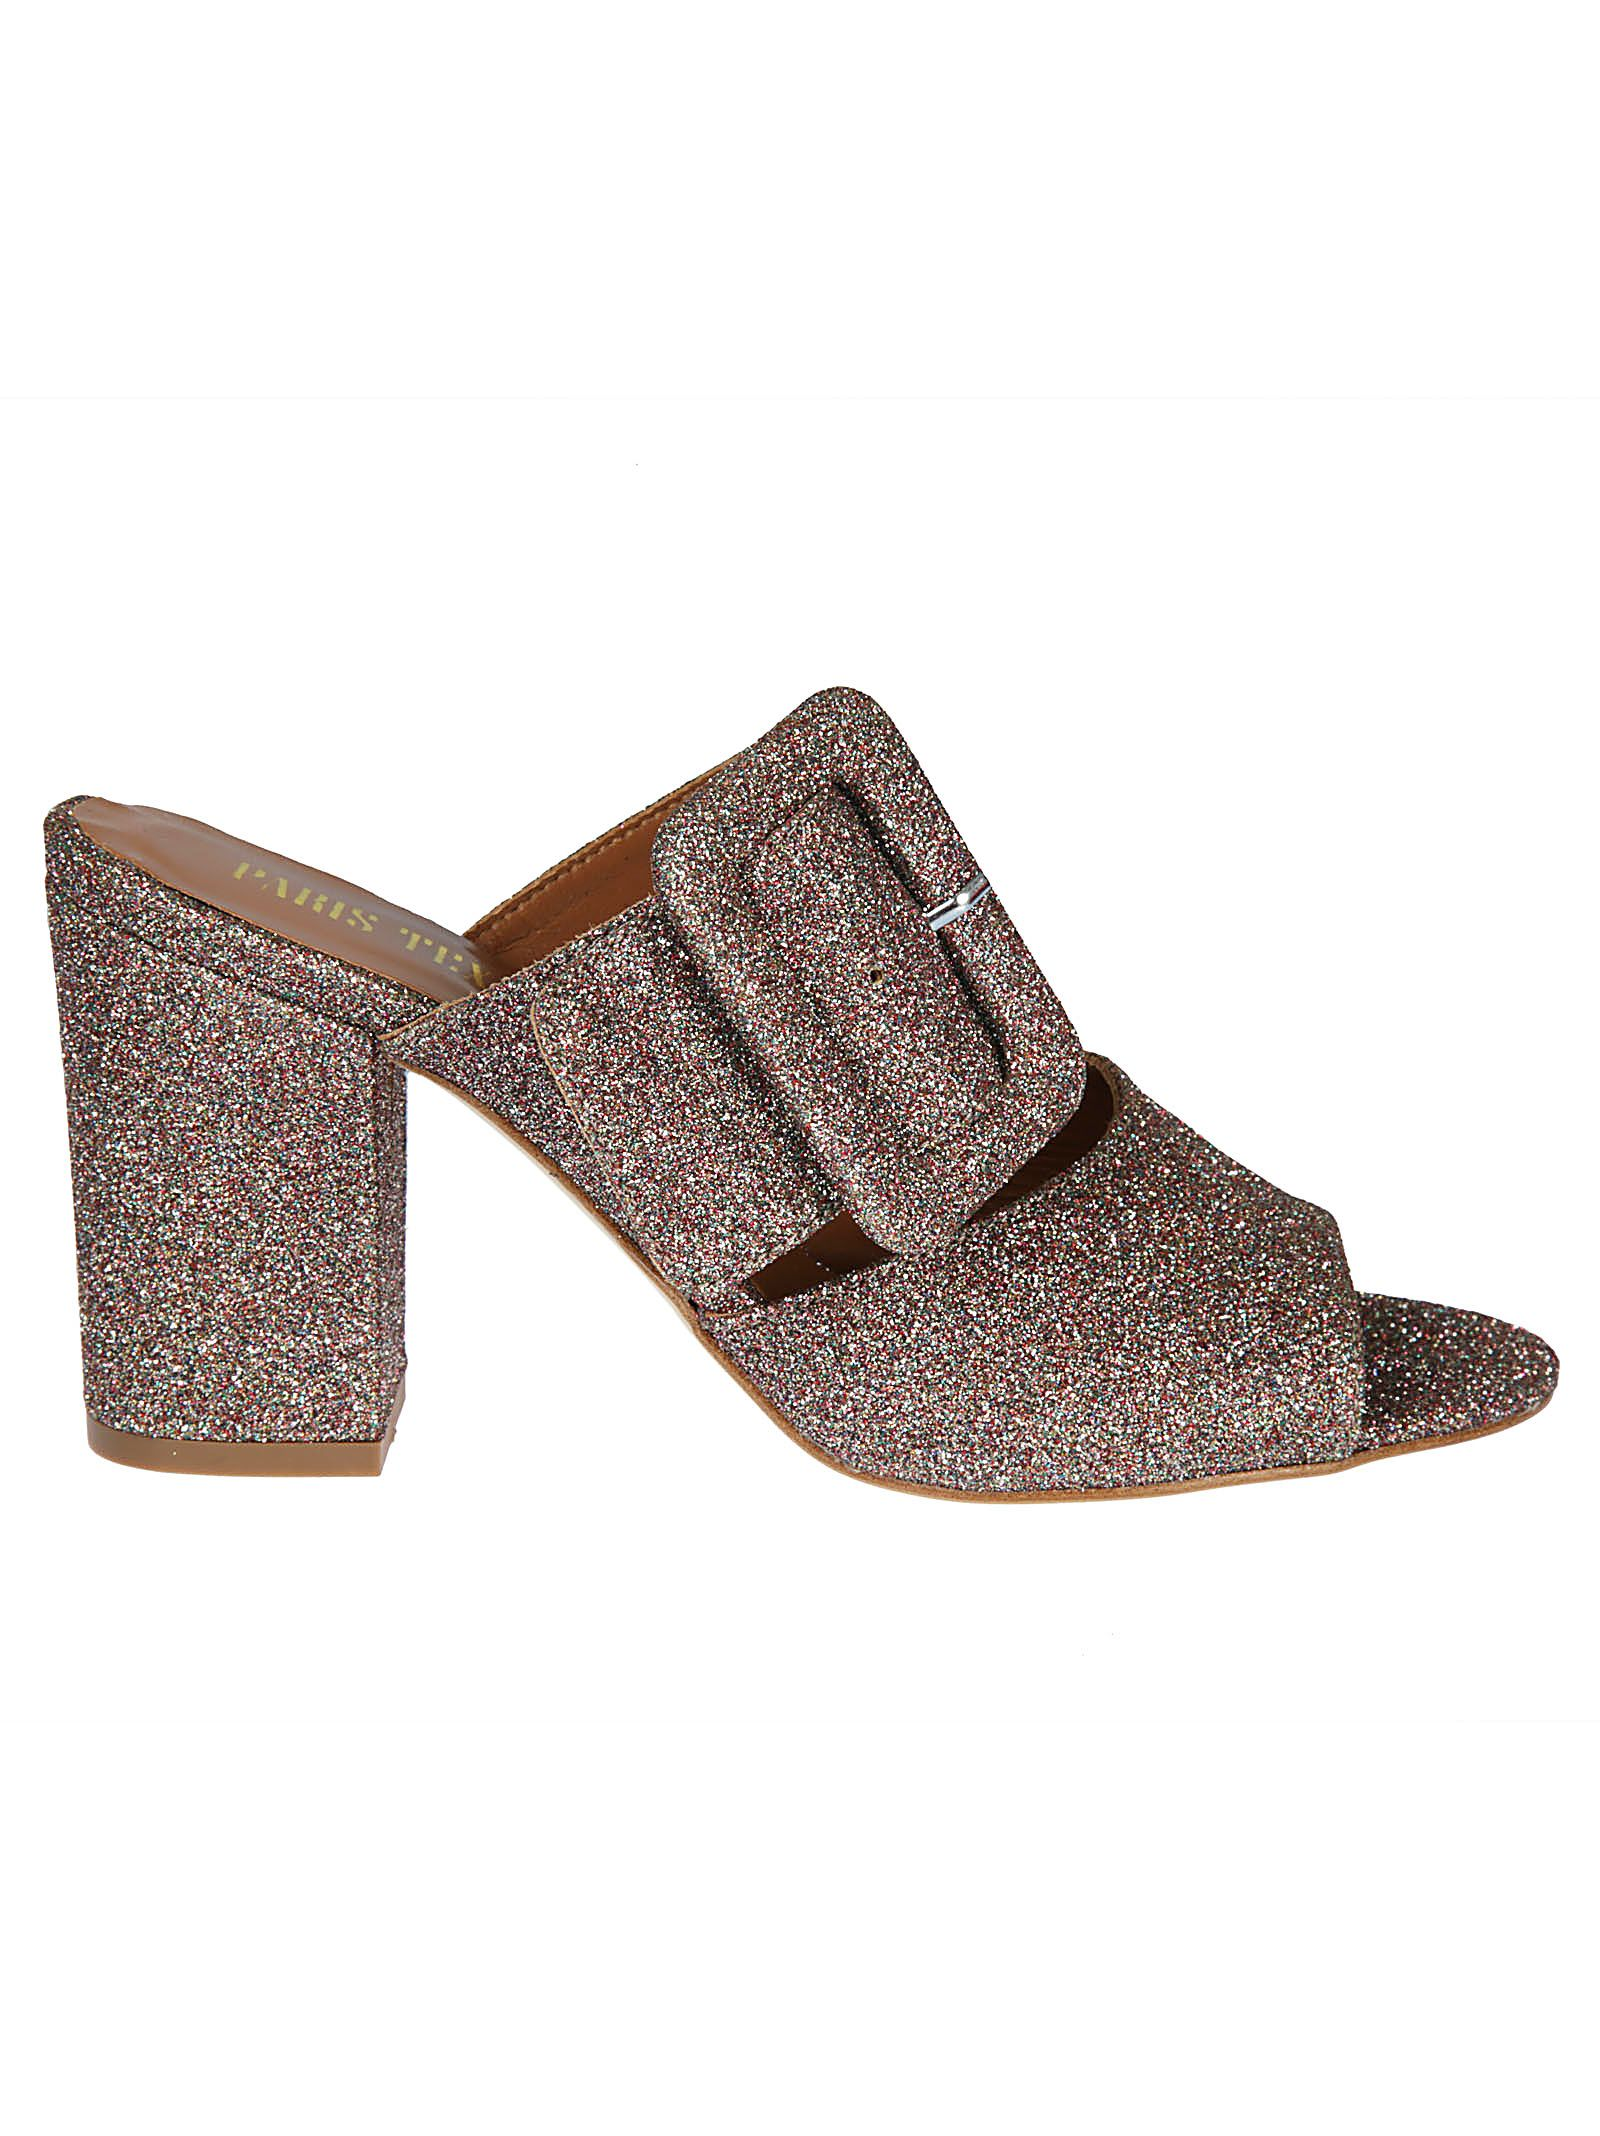 Paris Texas Glittered Mules